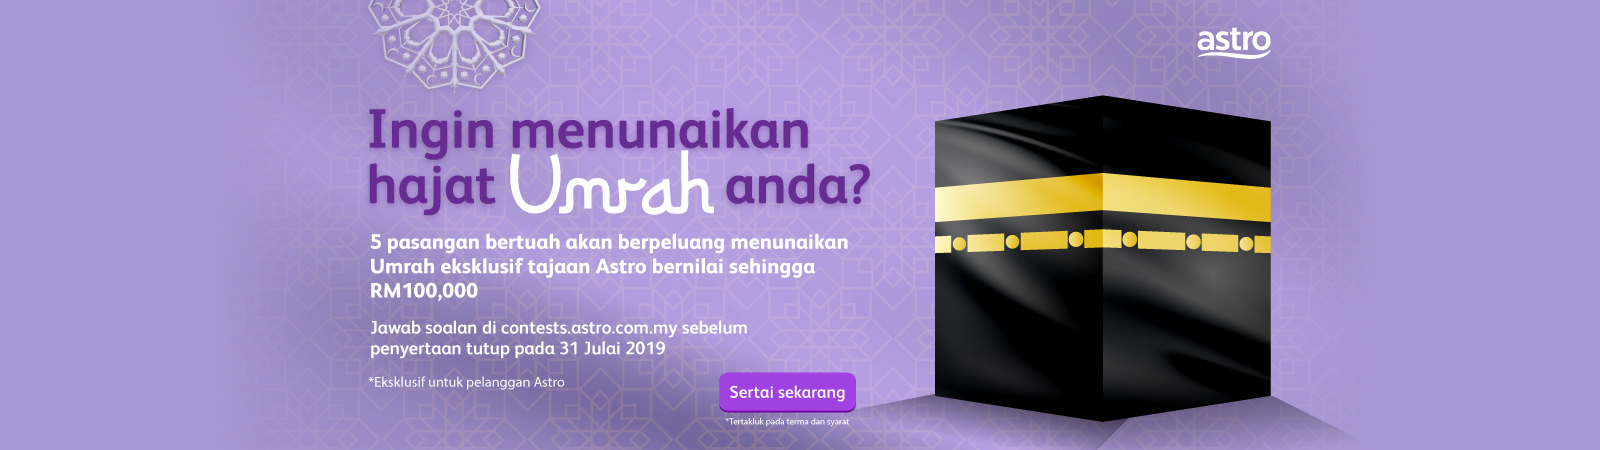 a603943ccf5f2 Astro – Pay TV, Radio, Digital Content & Consumer Services Provider